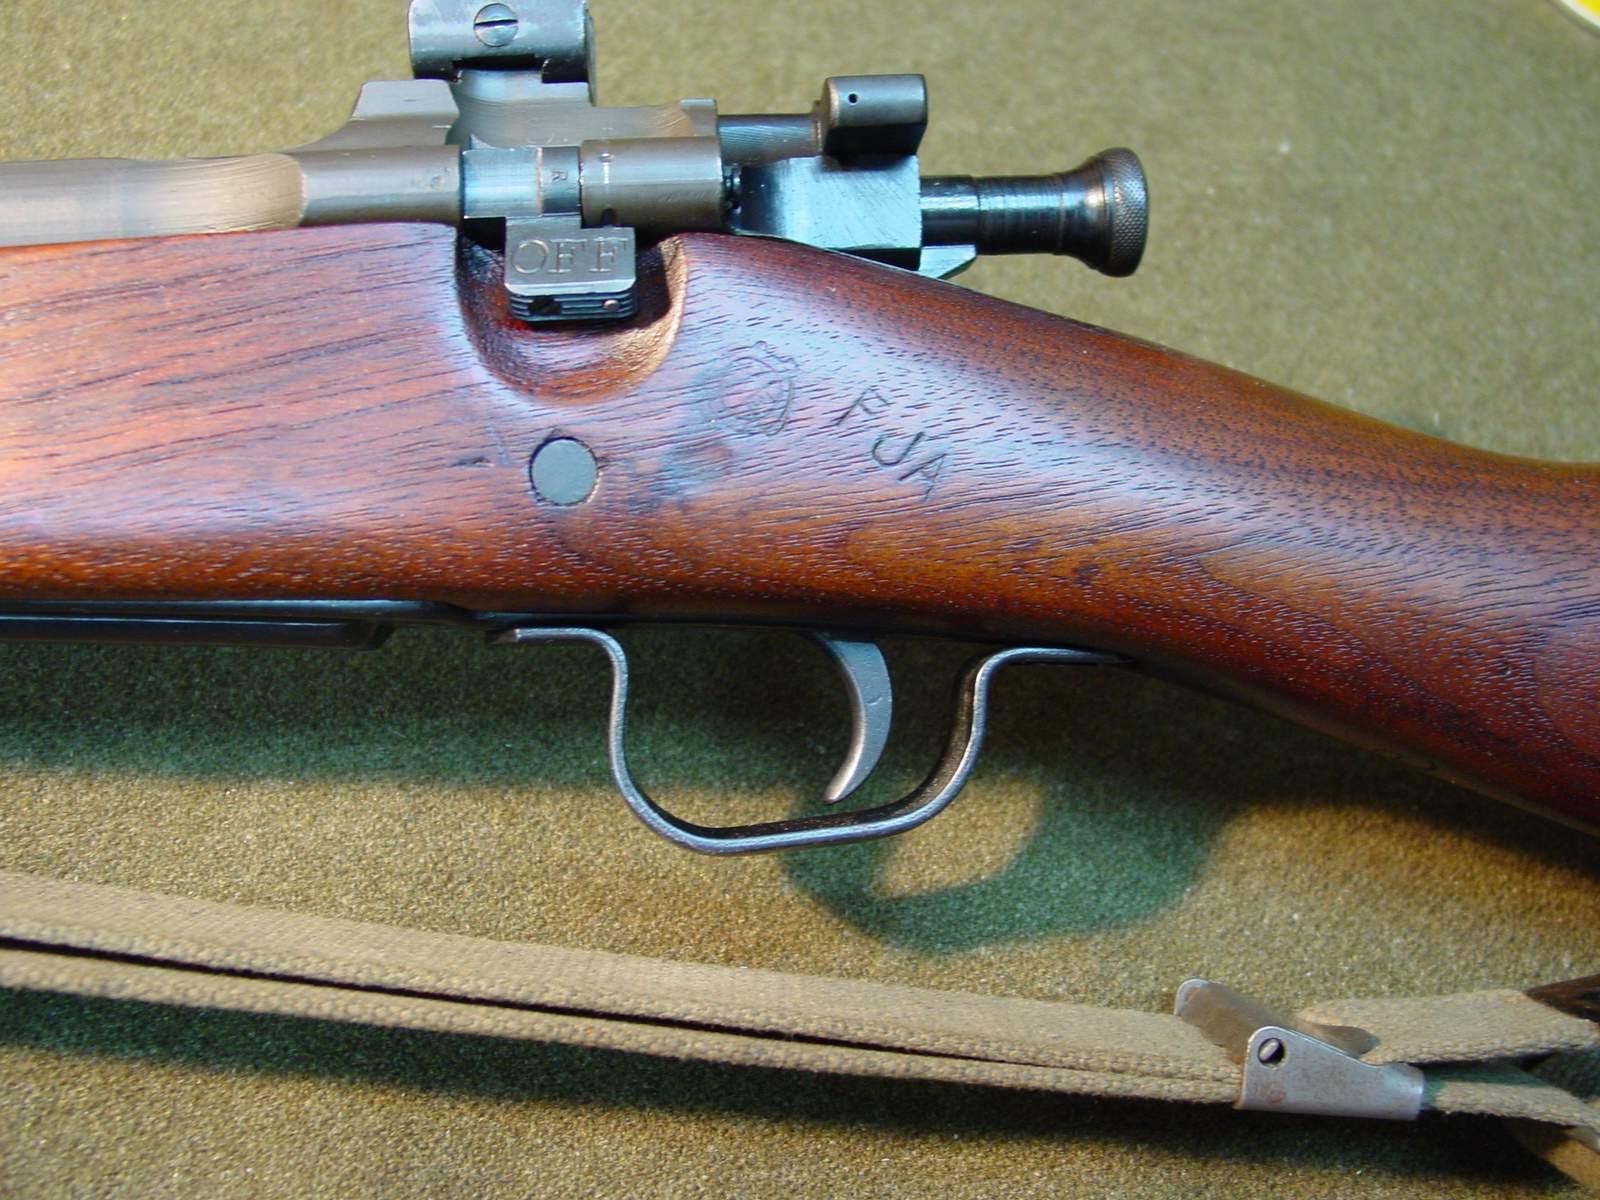 m1 rifle diagram triumph daytona 675 wiring schematic of carbine sks elsavadorla